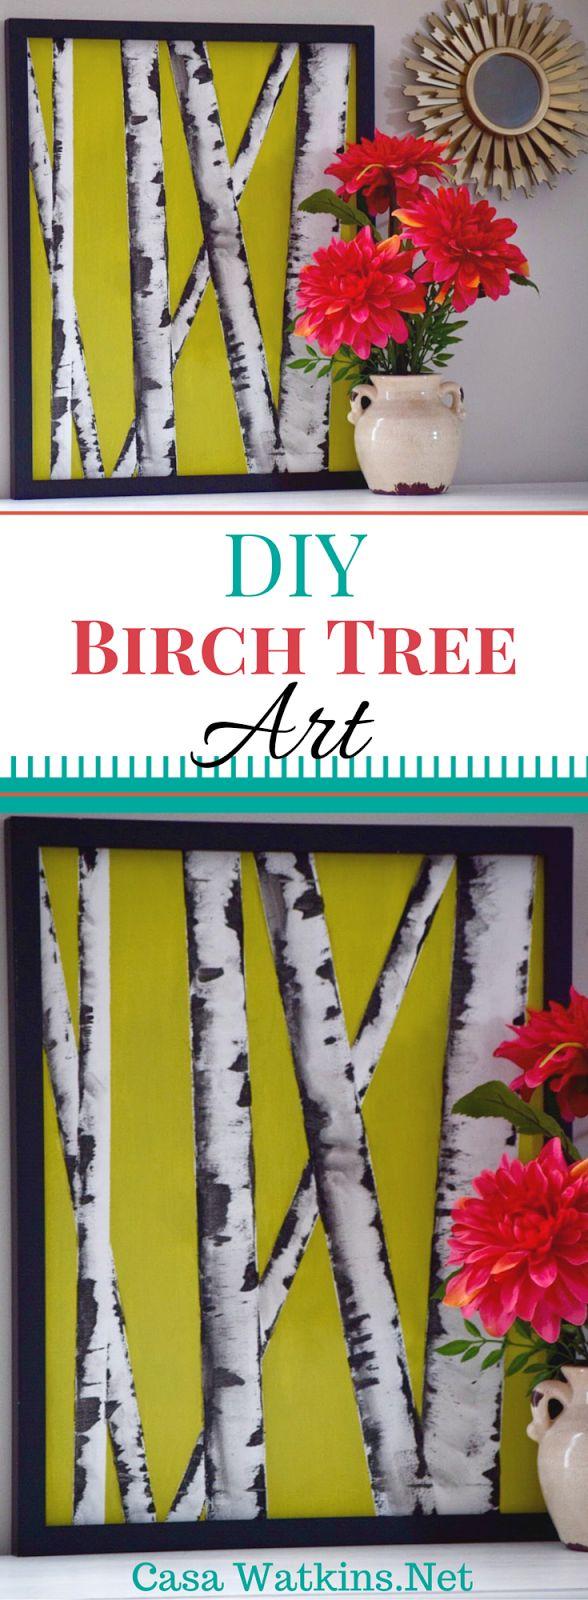 An easy to do DIY Birch Tree Art from Casa Watkins.net